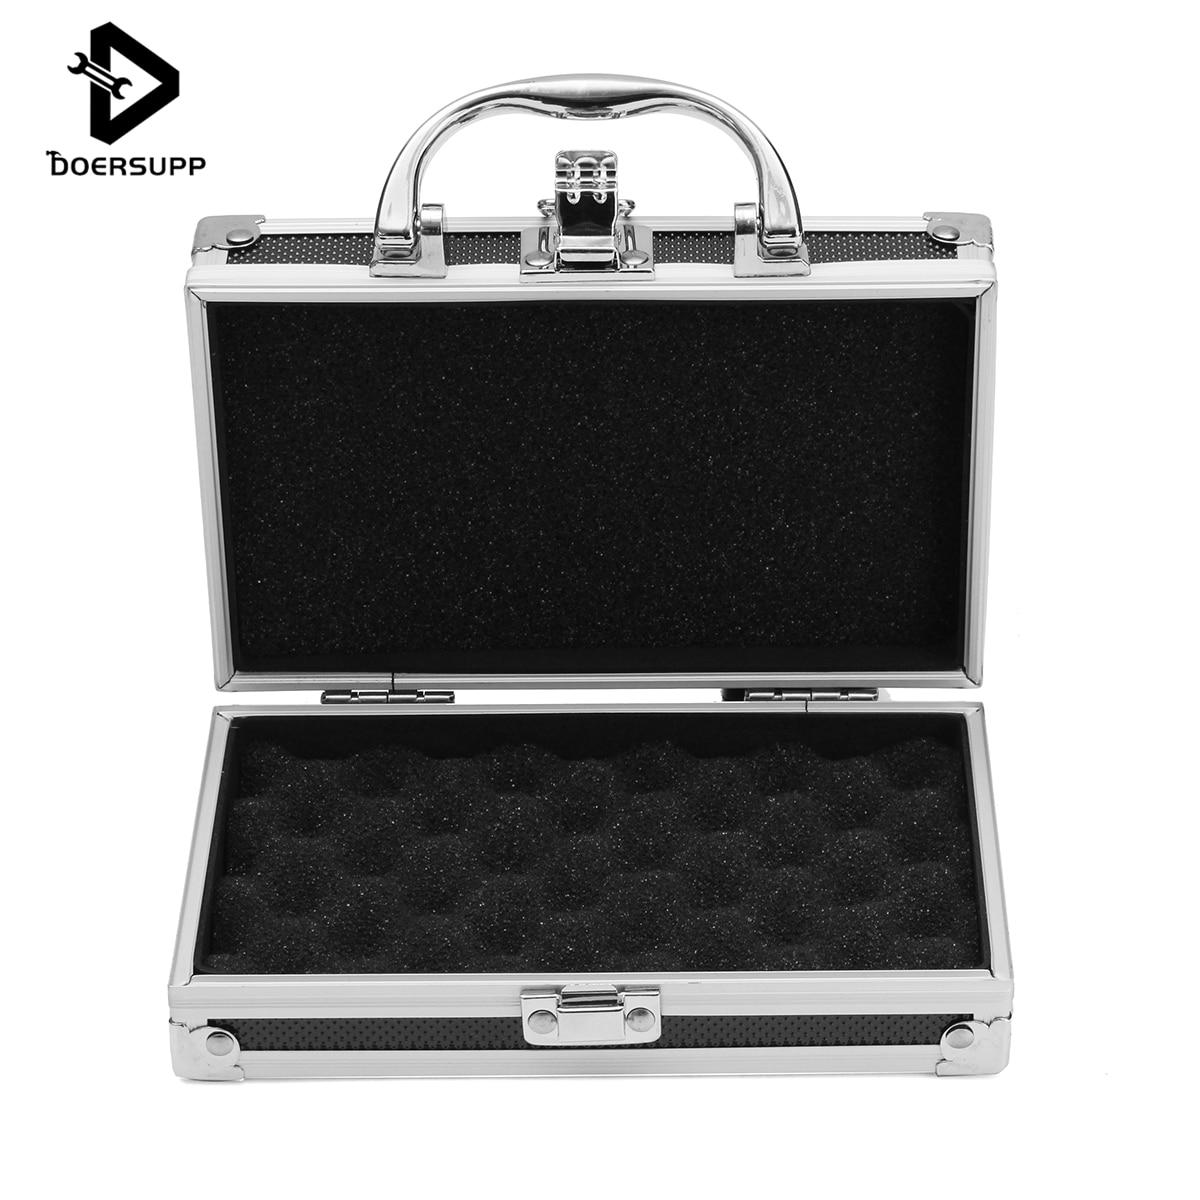 Doersupp Aluminium Alloy Tool Box Portable Small Handle Storage Suitcase Travel Luggage Organizer Case Handheld Organizer